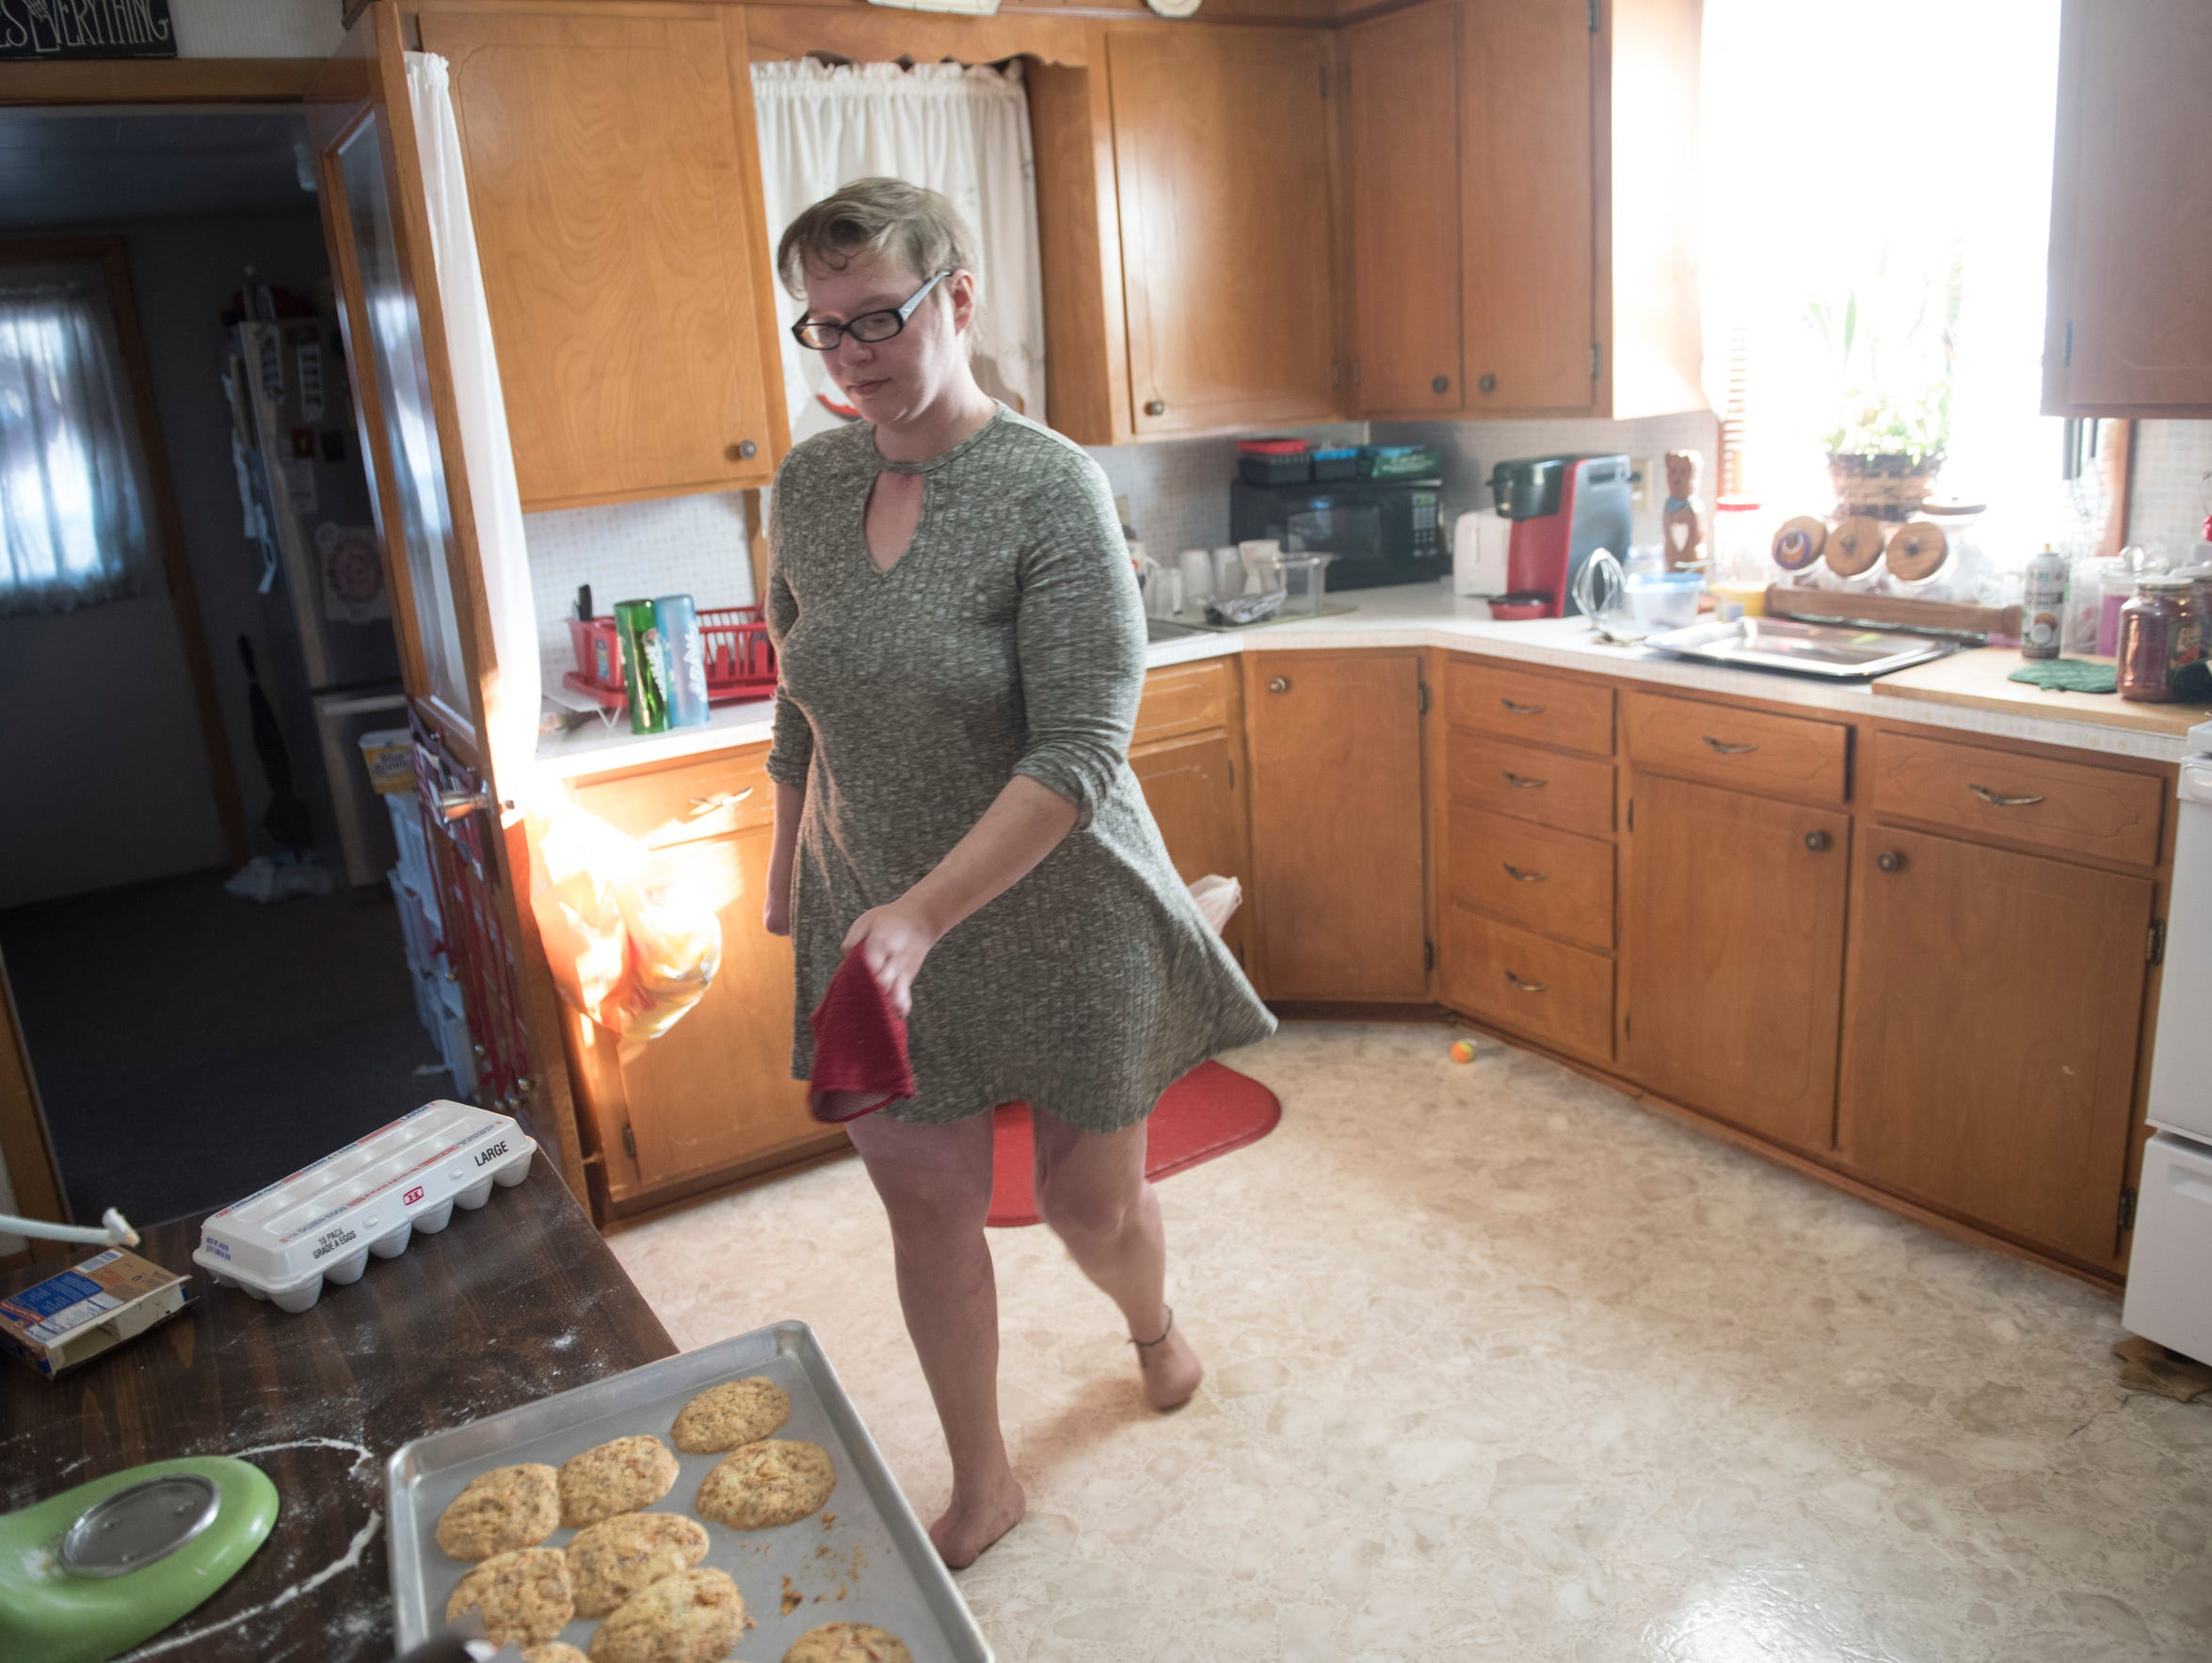 Natasha Dillow gets holiday baking done at her home